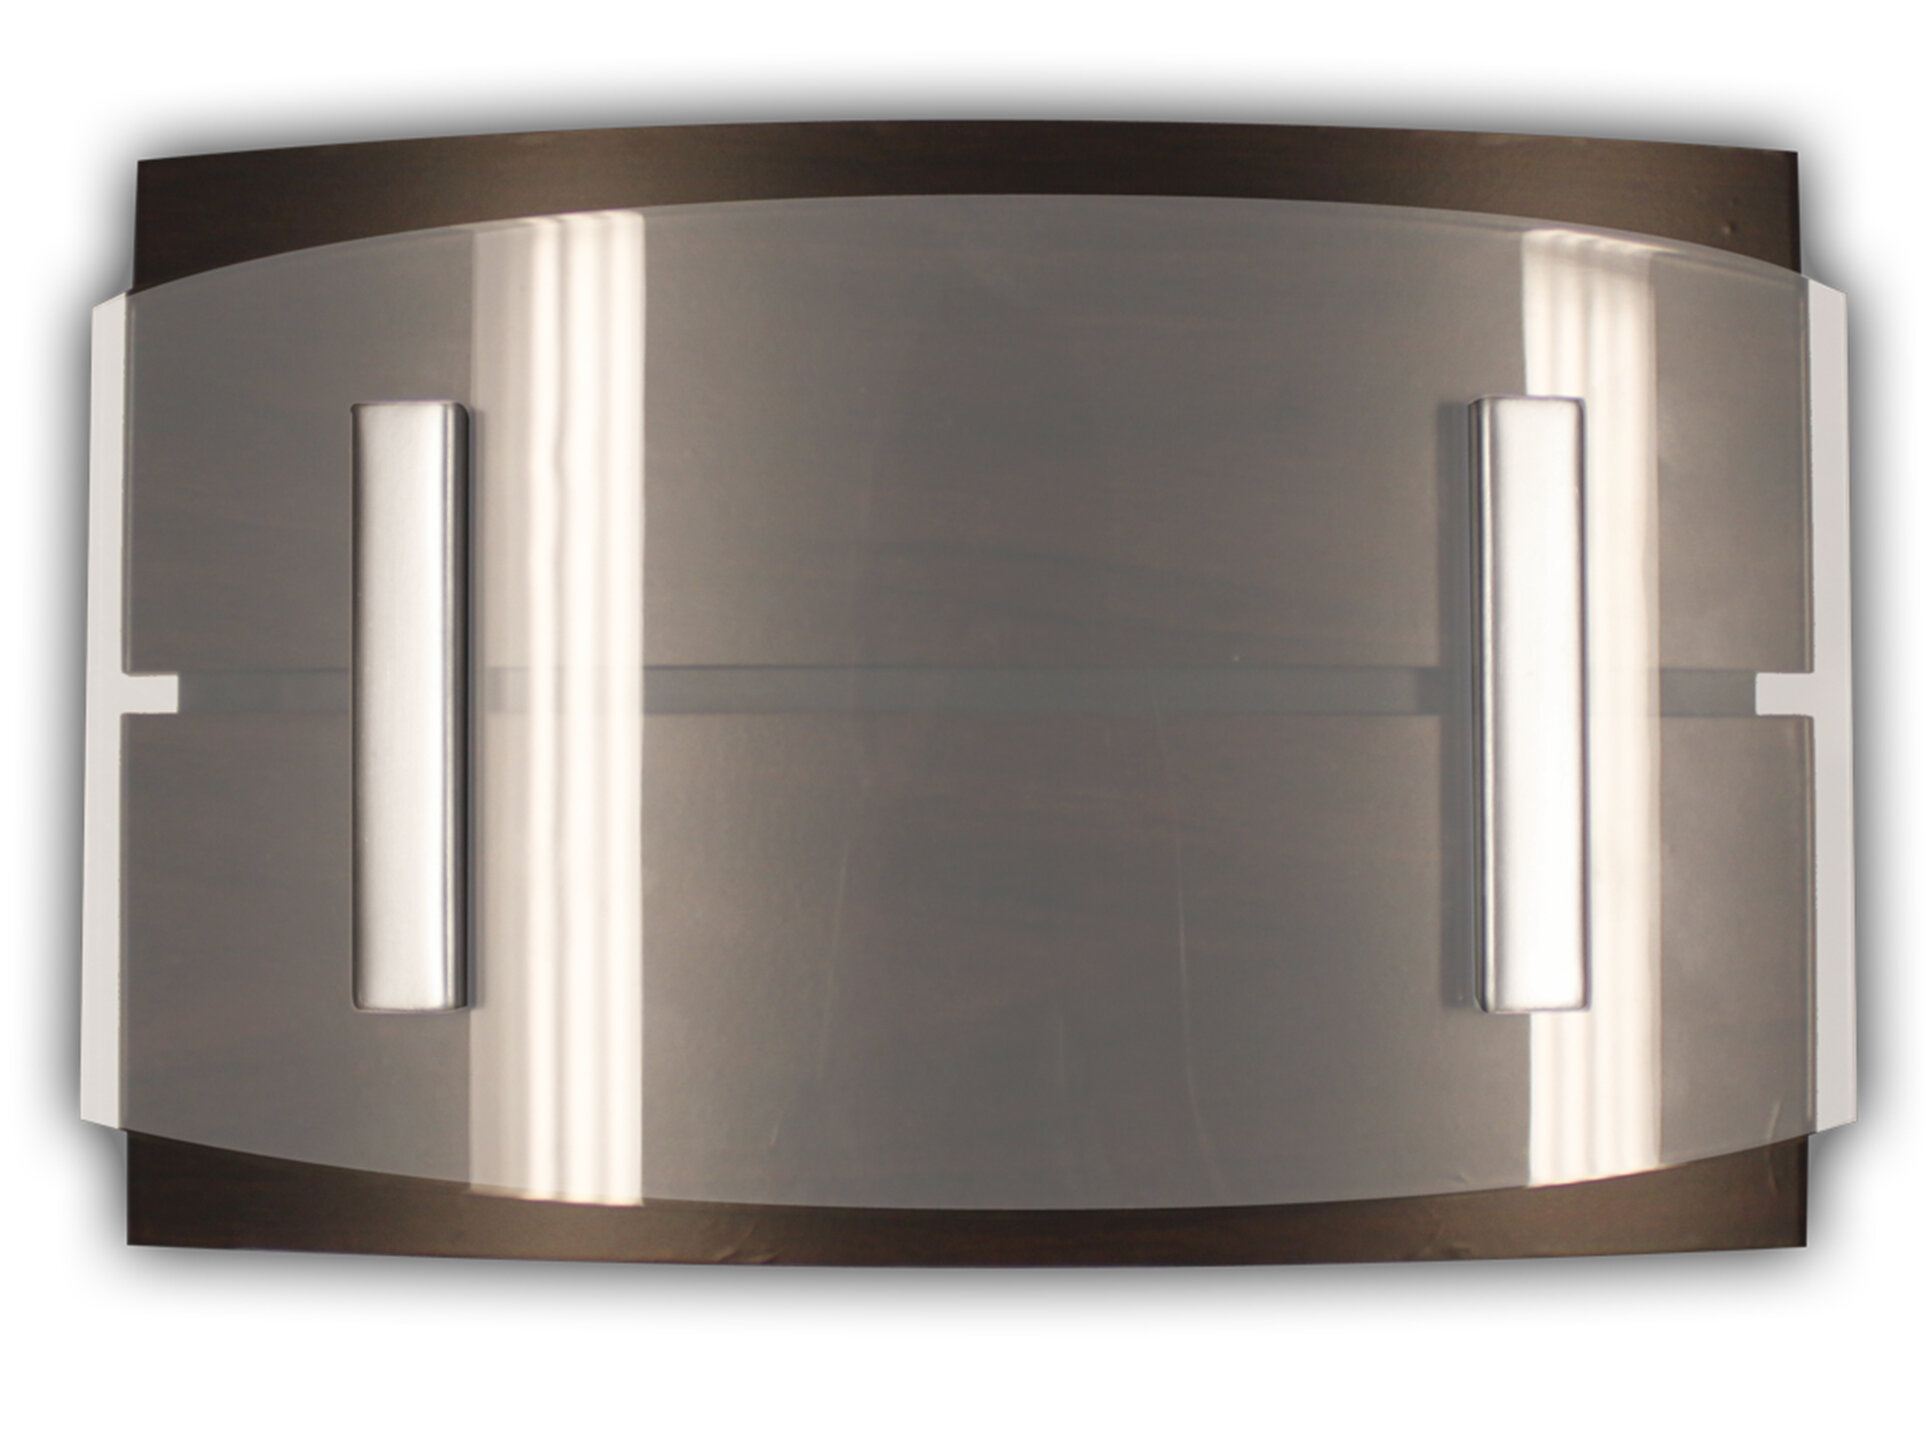 Heath-Zenith Wireless Battery Operated Chime Kit | Wayfair